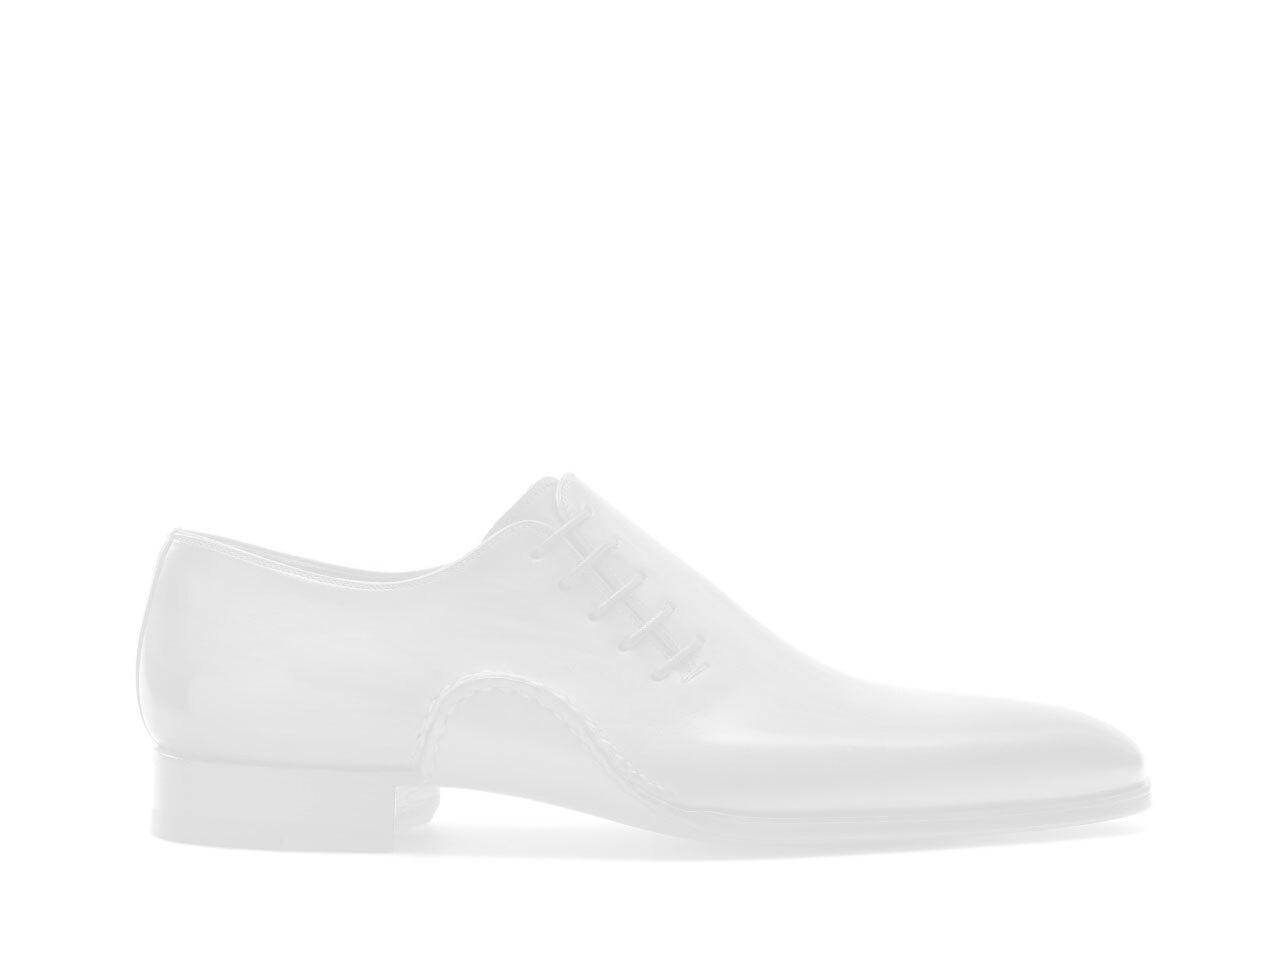 Sole of the Magnanni Marco Cuero Men's Single Monk Strap Shoes